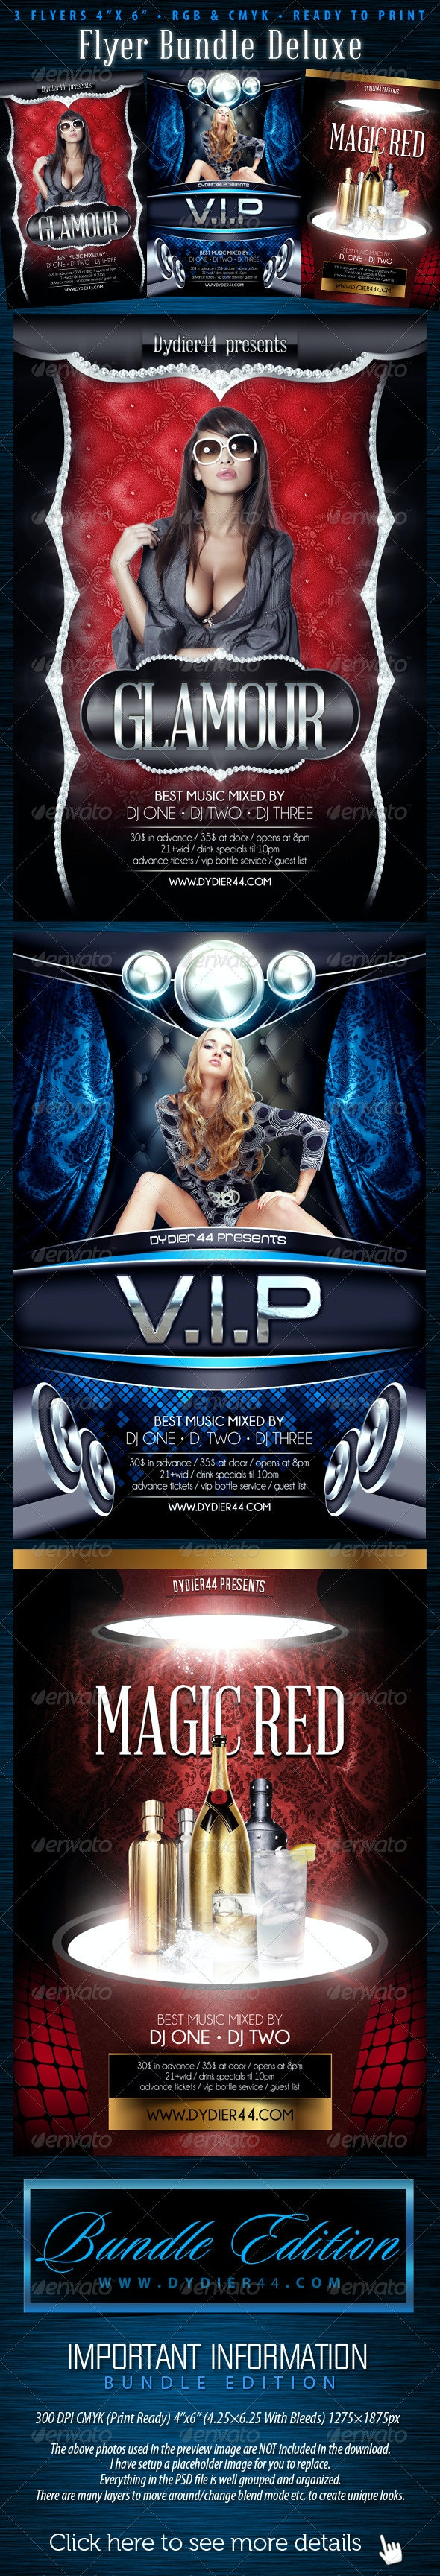 Flyer Bundle Deluxe (Flyer Template 4x6) - Clubs & Parties Events